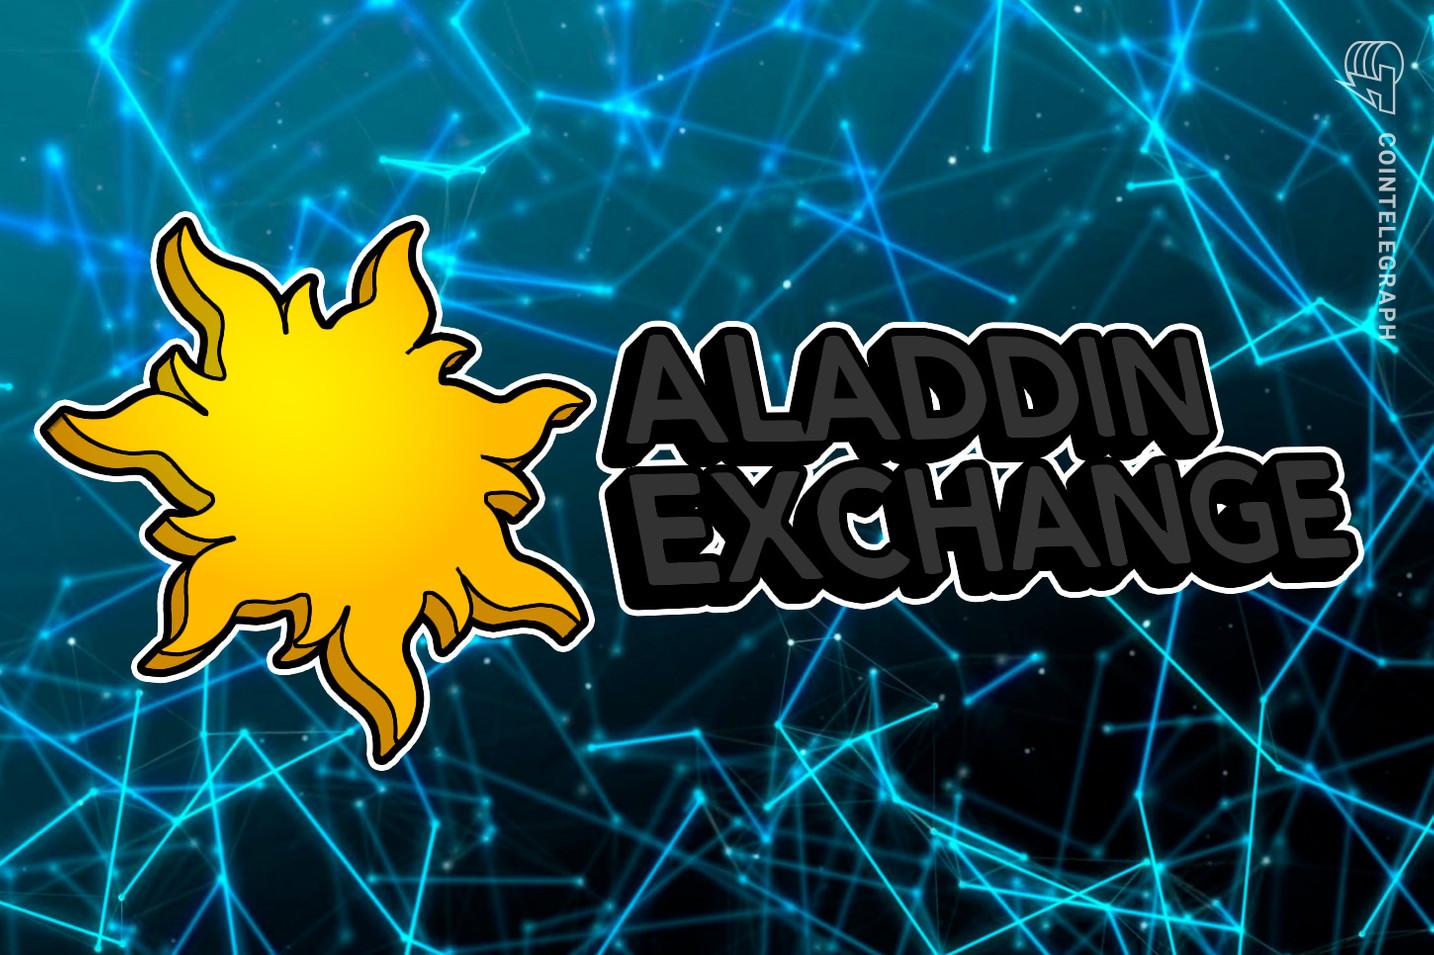 TNC IT Group's Aladdin Exchange pre-launch event begins